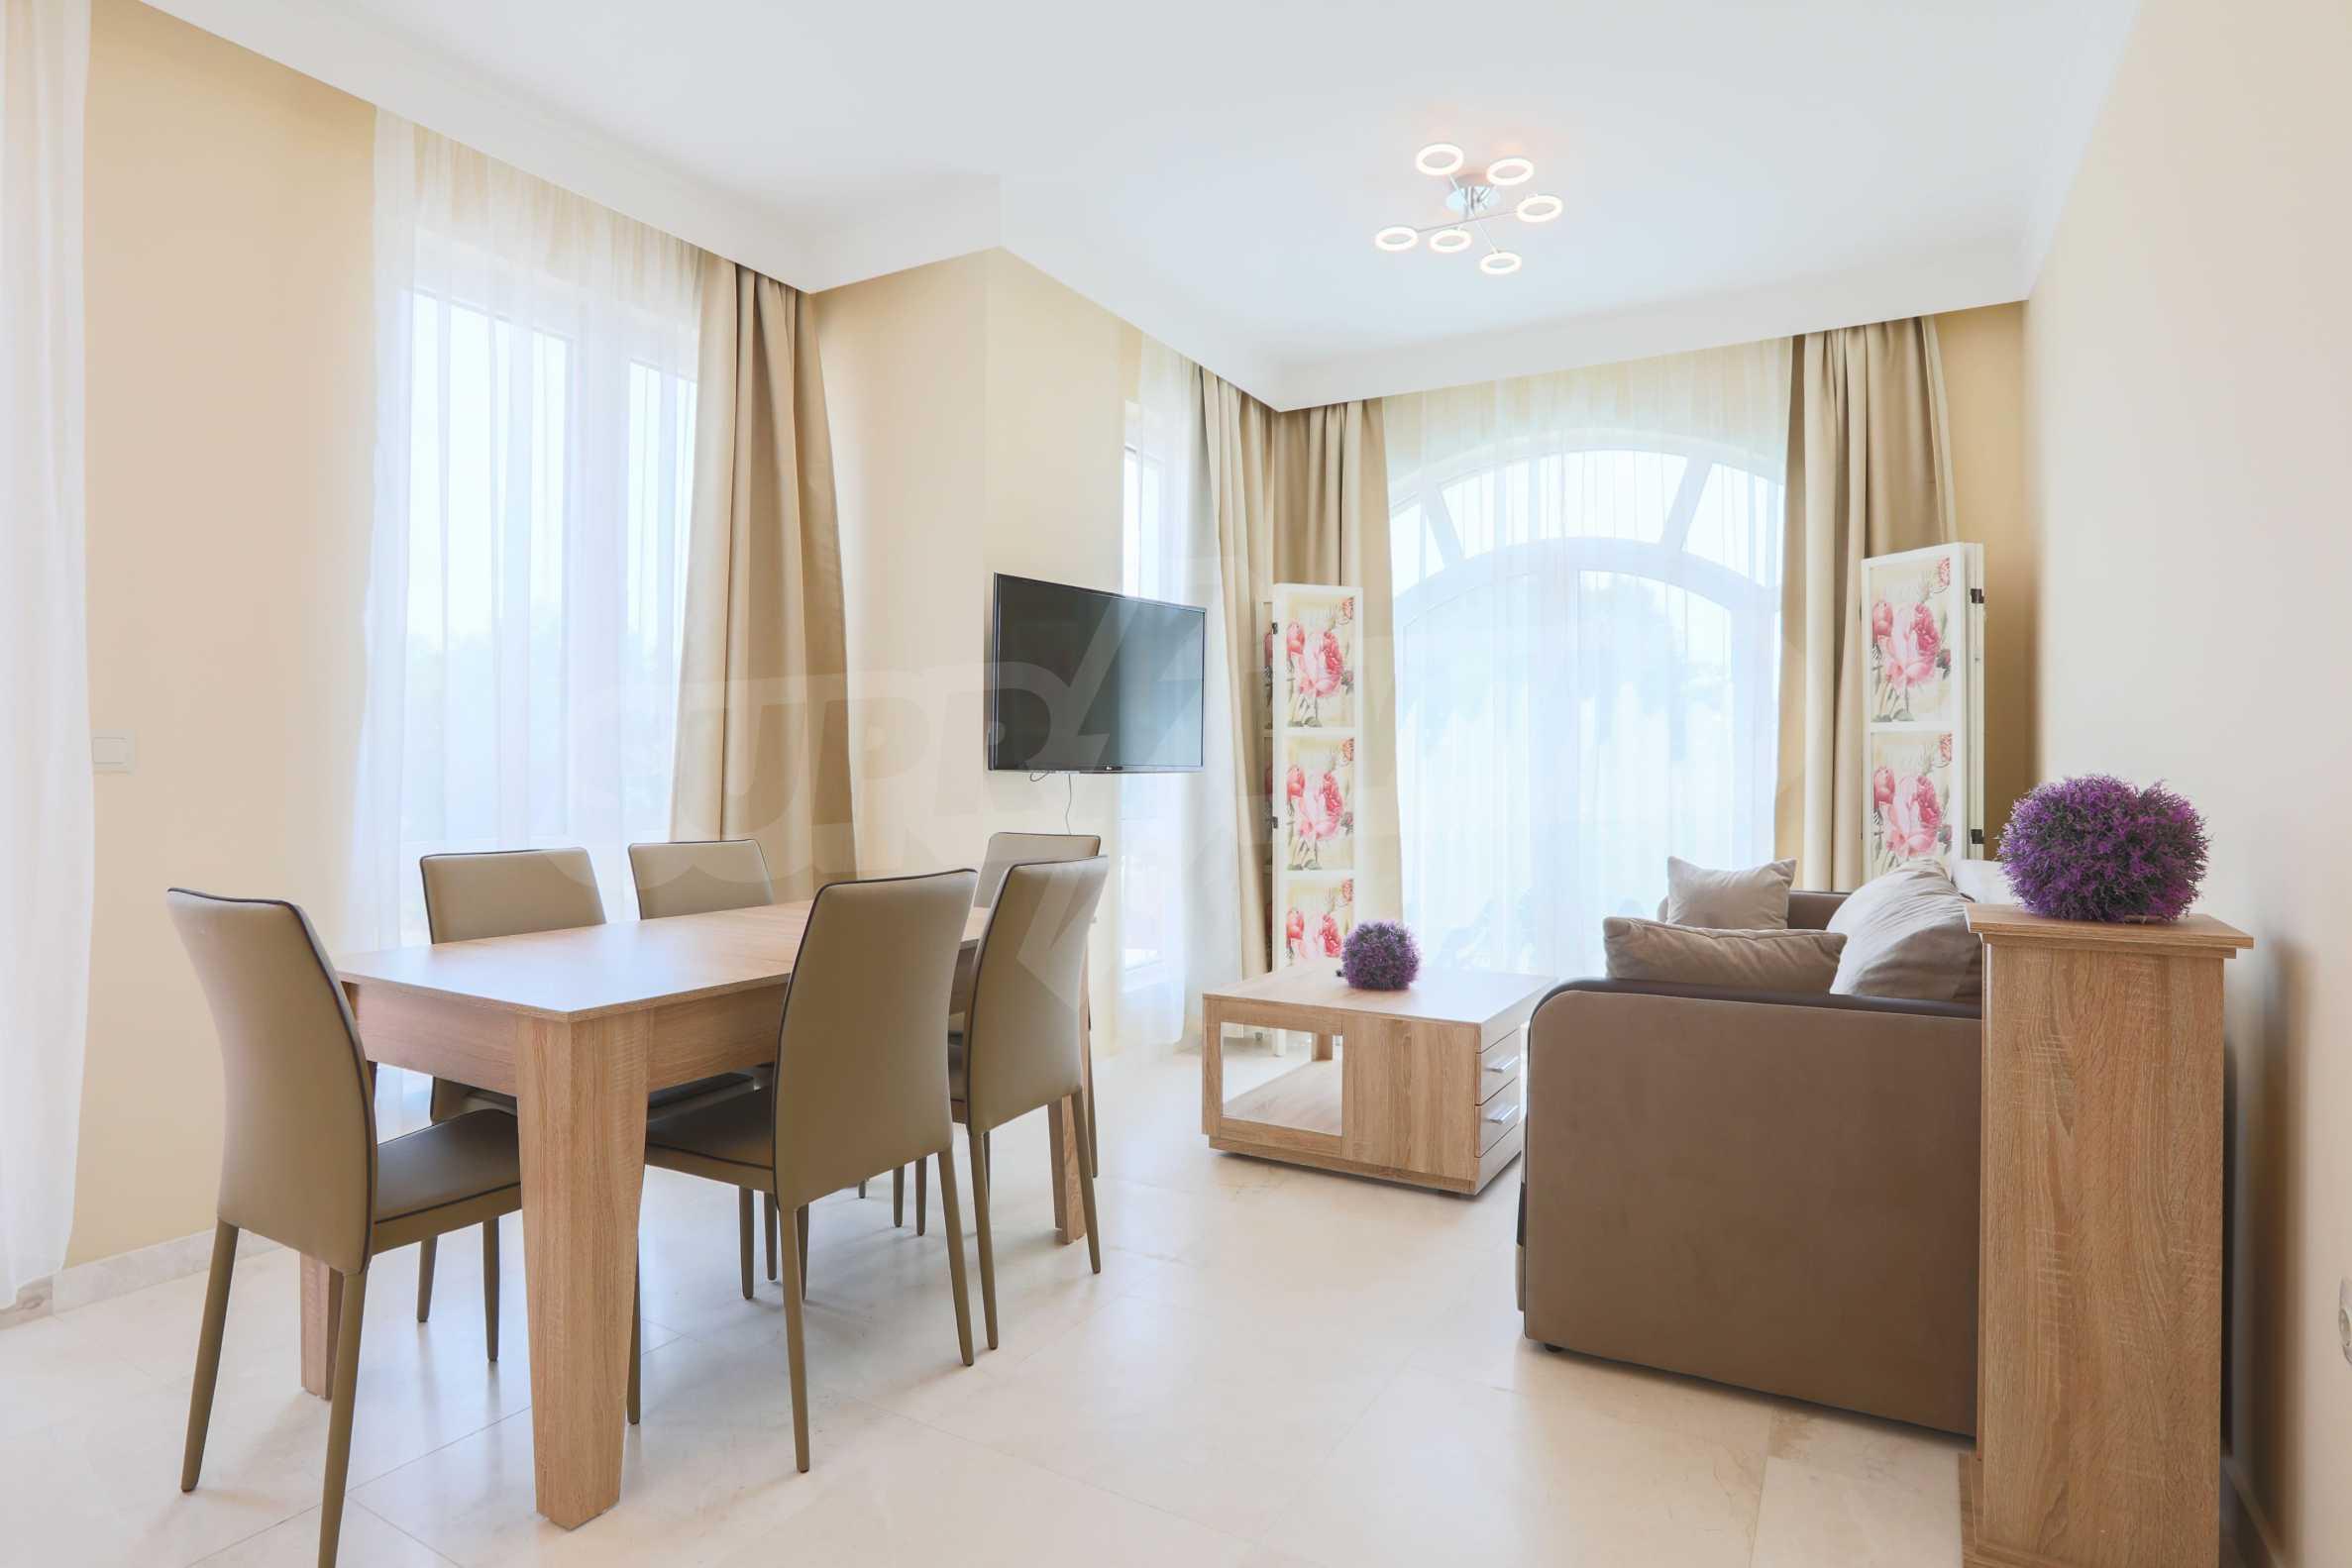 Комфортен двустаен апартамент под наем в Belle Époque Beach Residence, курорт Лозенец